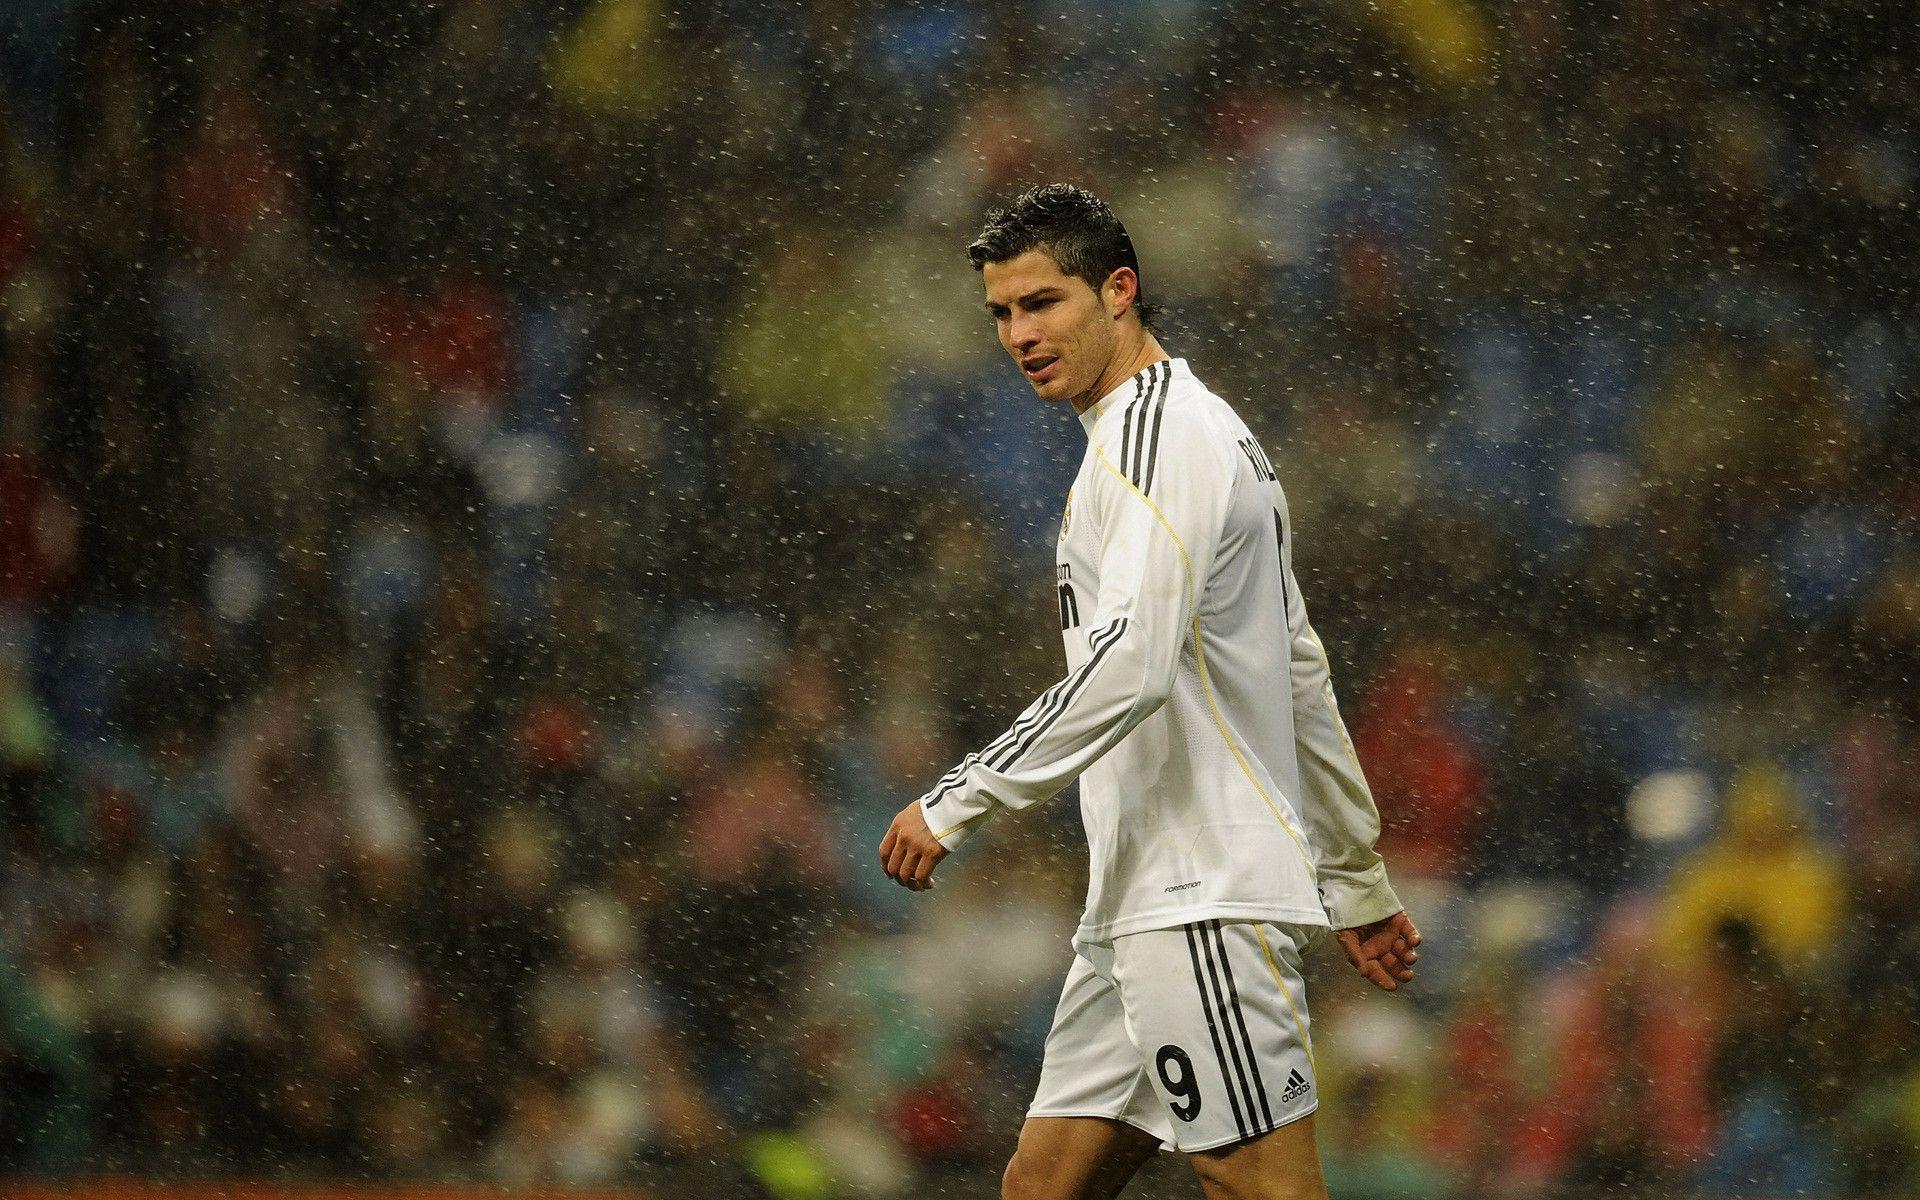 Cristiano Ronaldo Real Madrid Wallpapers | HD Wallpapers